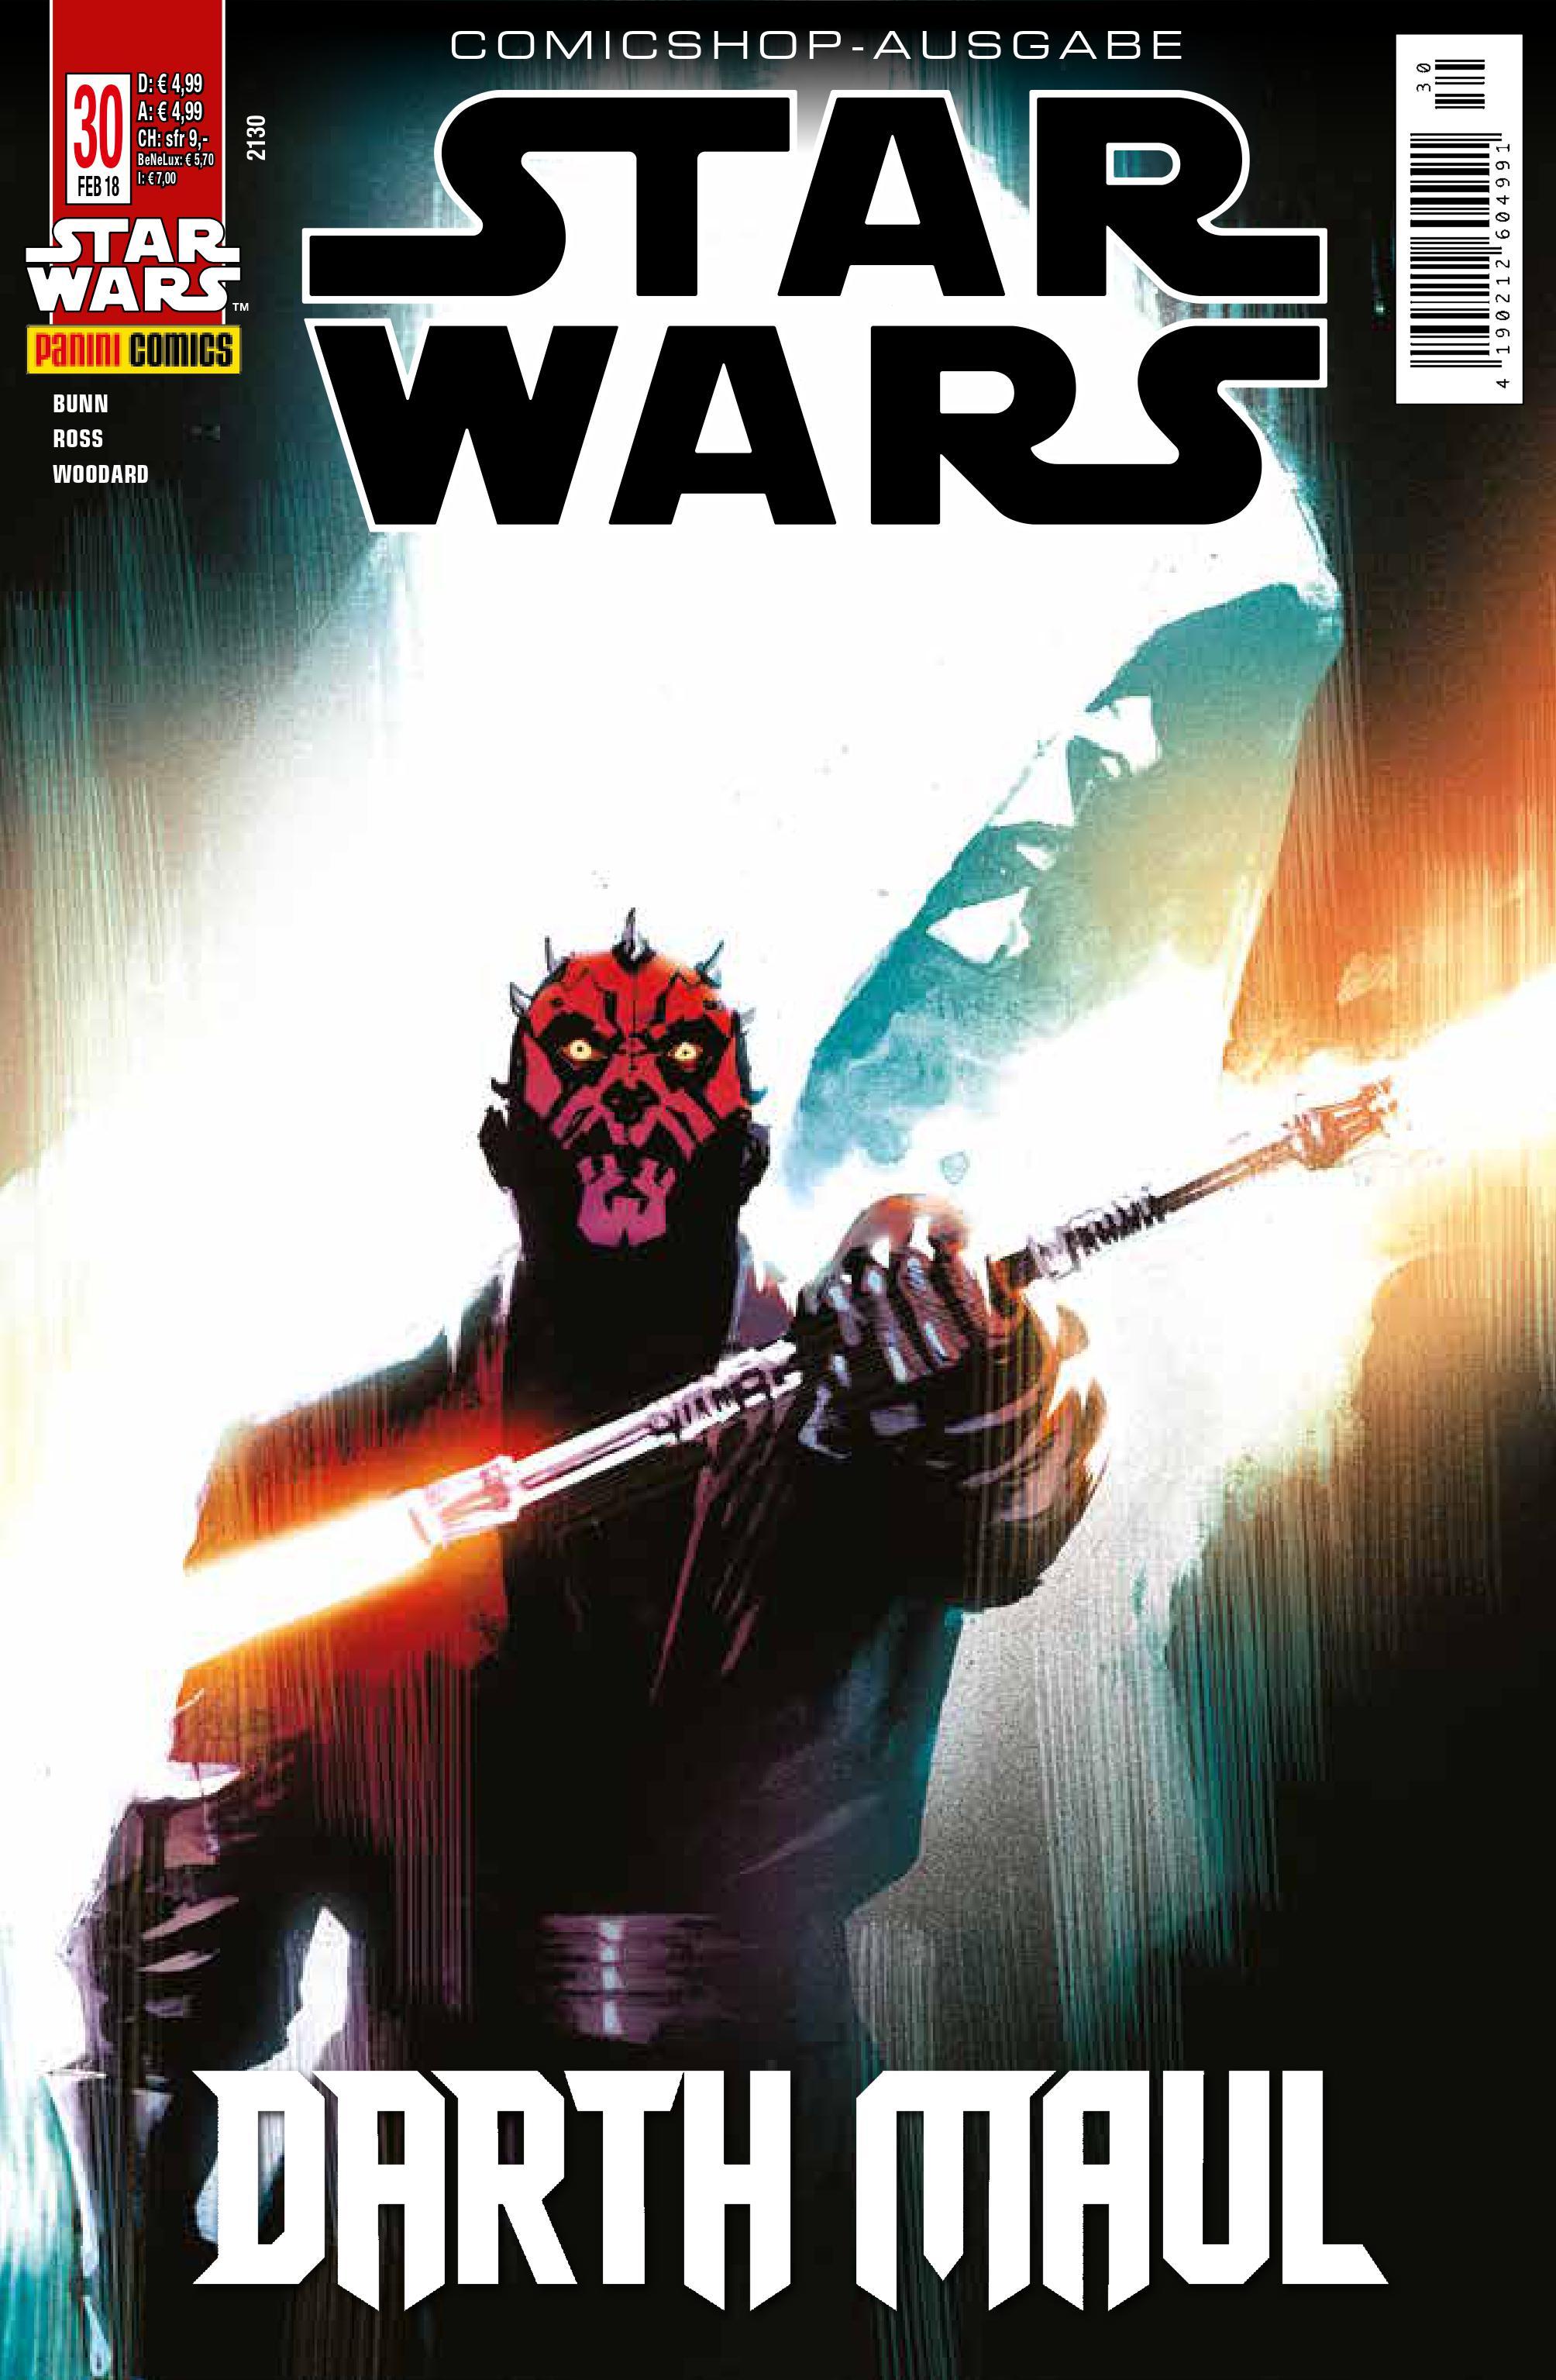 Star Wars #30 (Comicshop-Ausgabe) (30.01.2018)